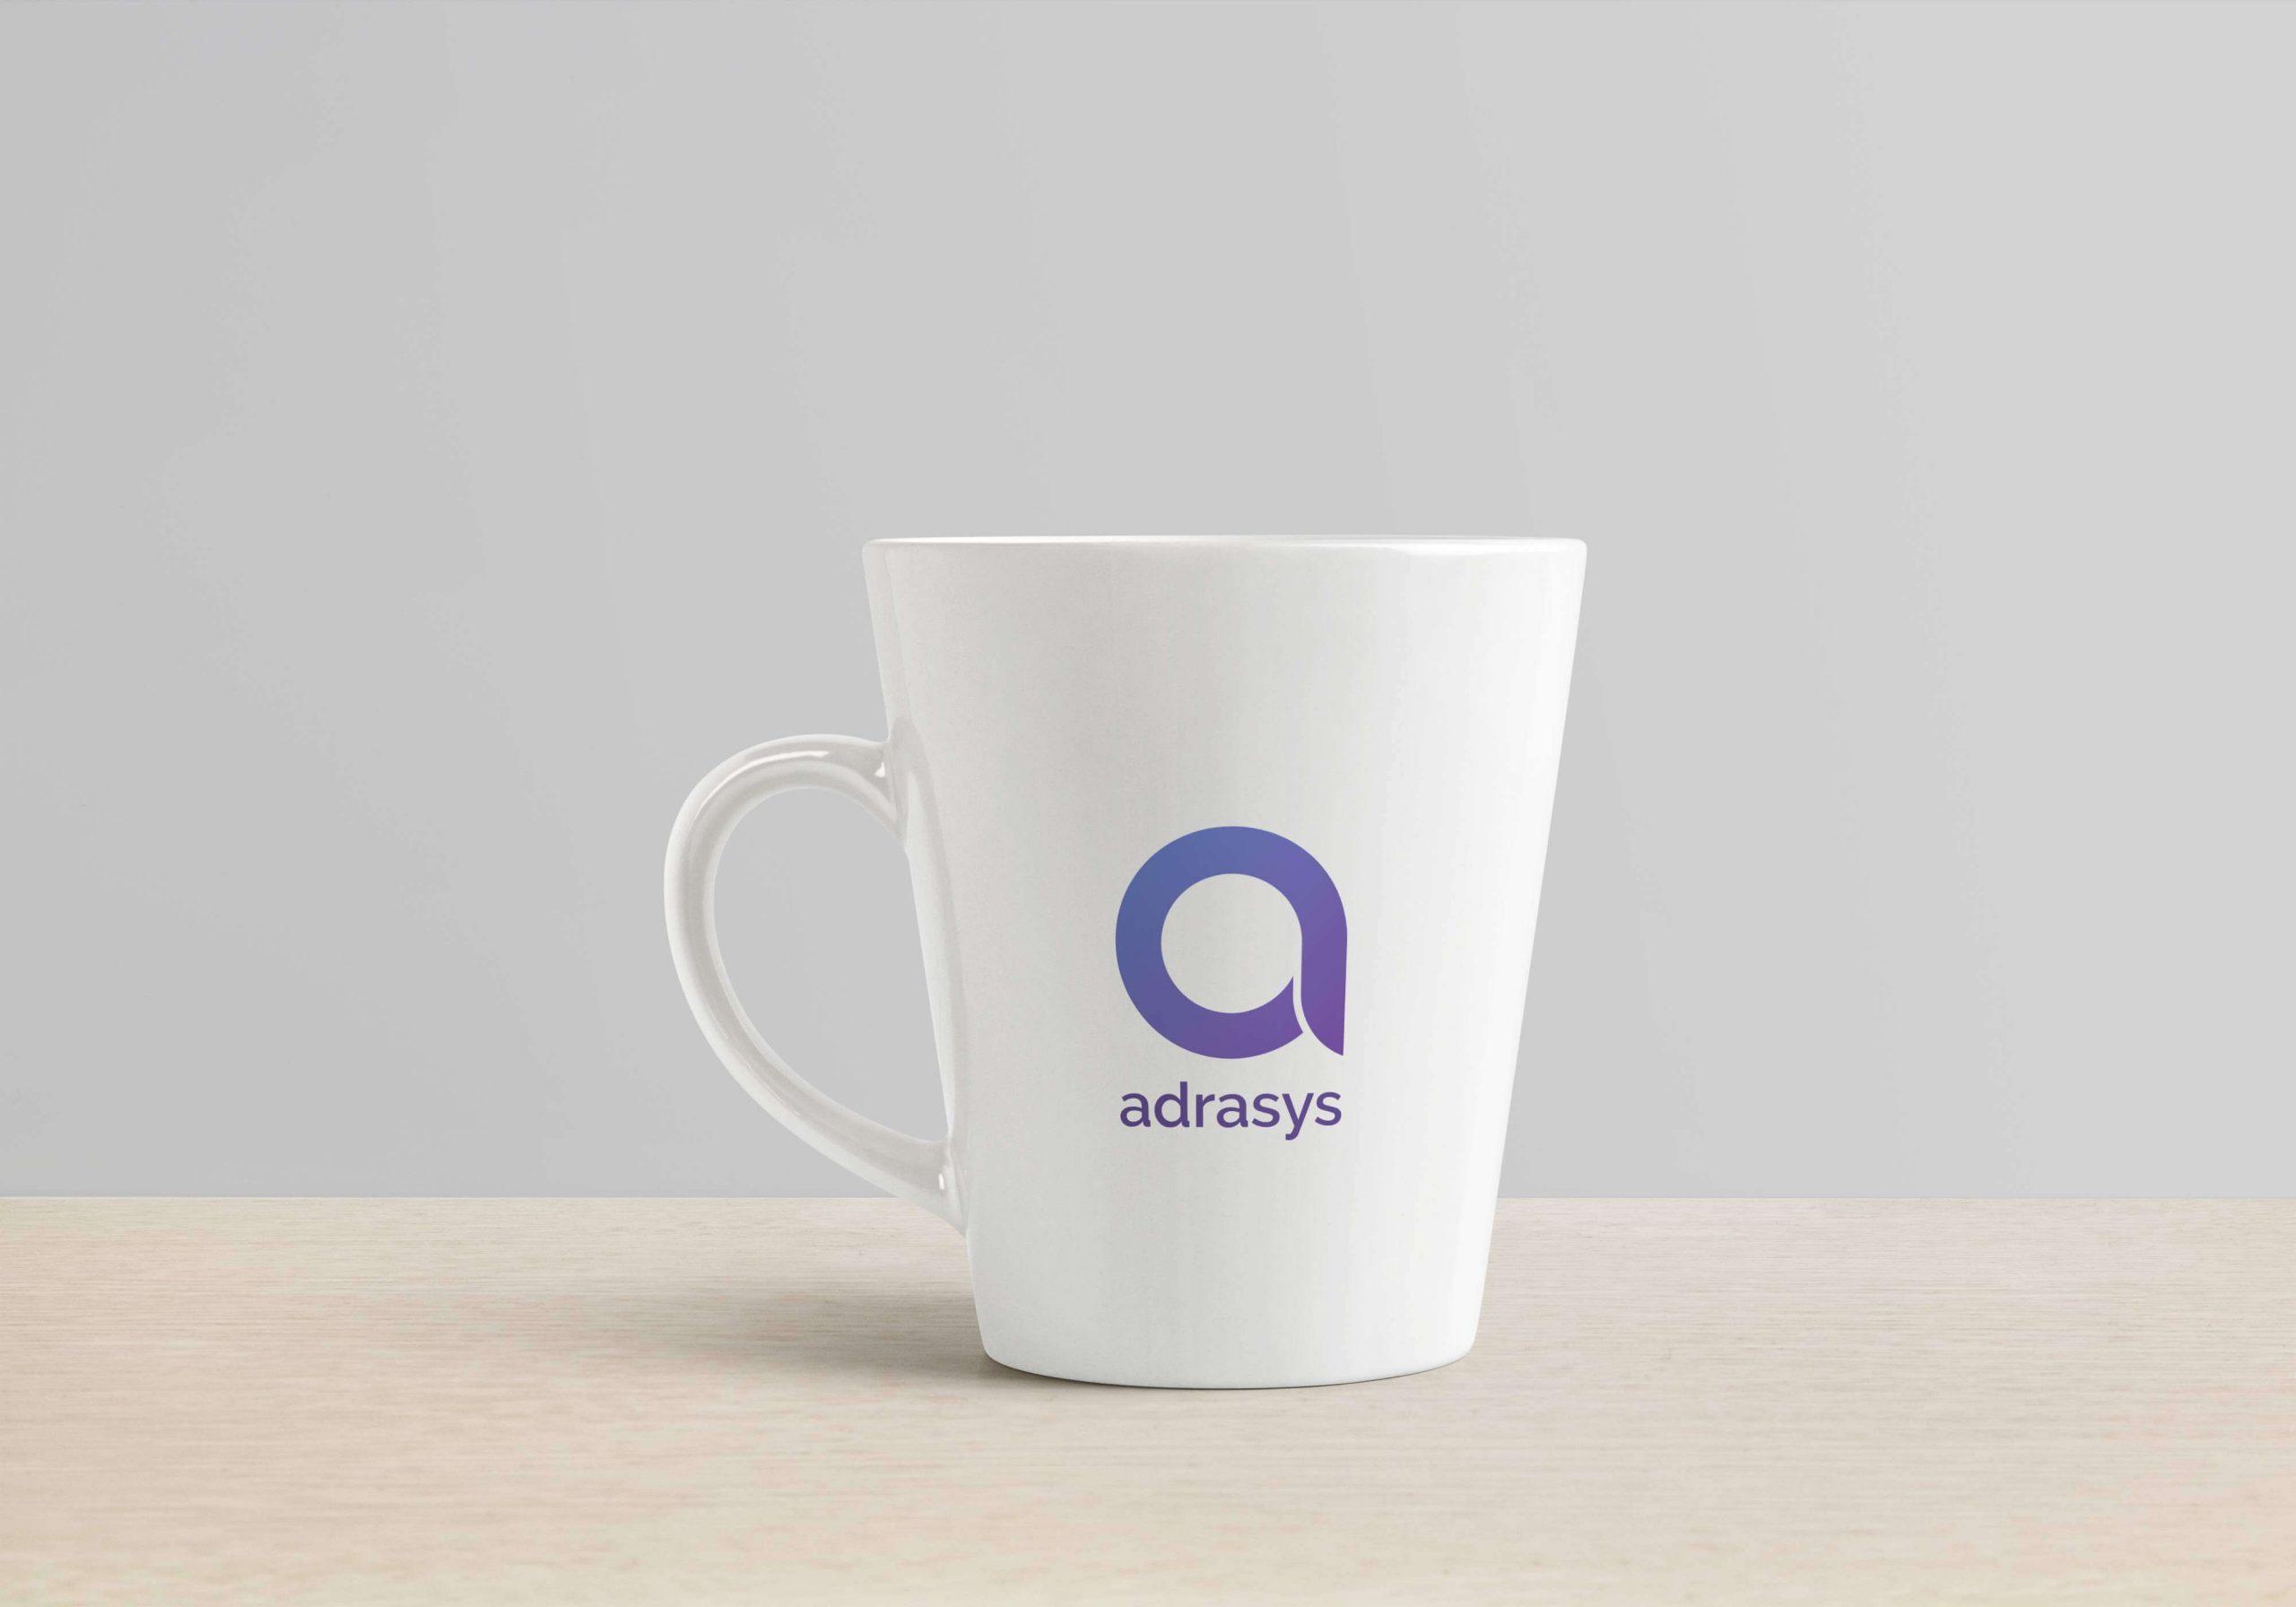 Photo du logo Adrasys apposé sur un mug.